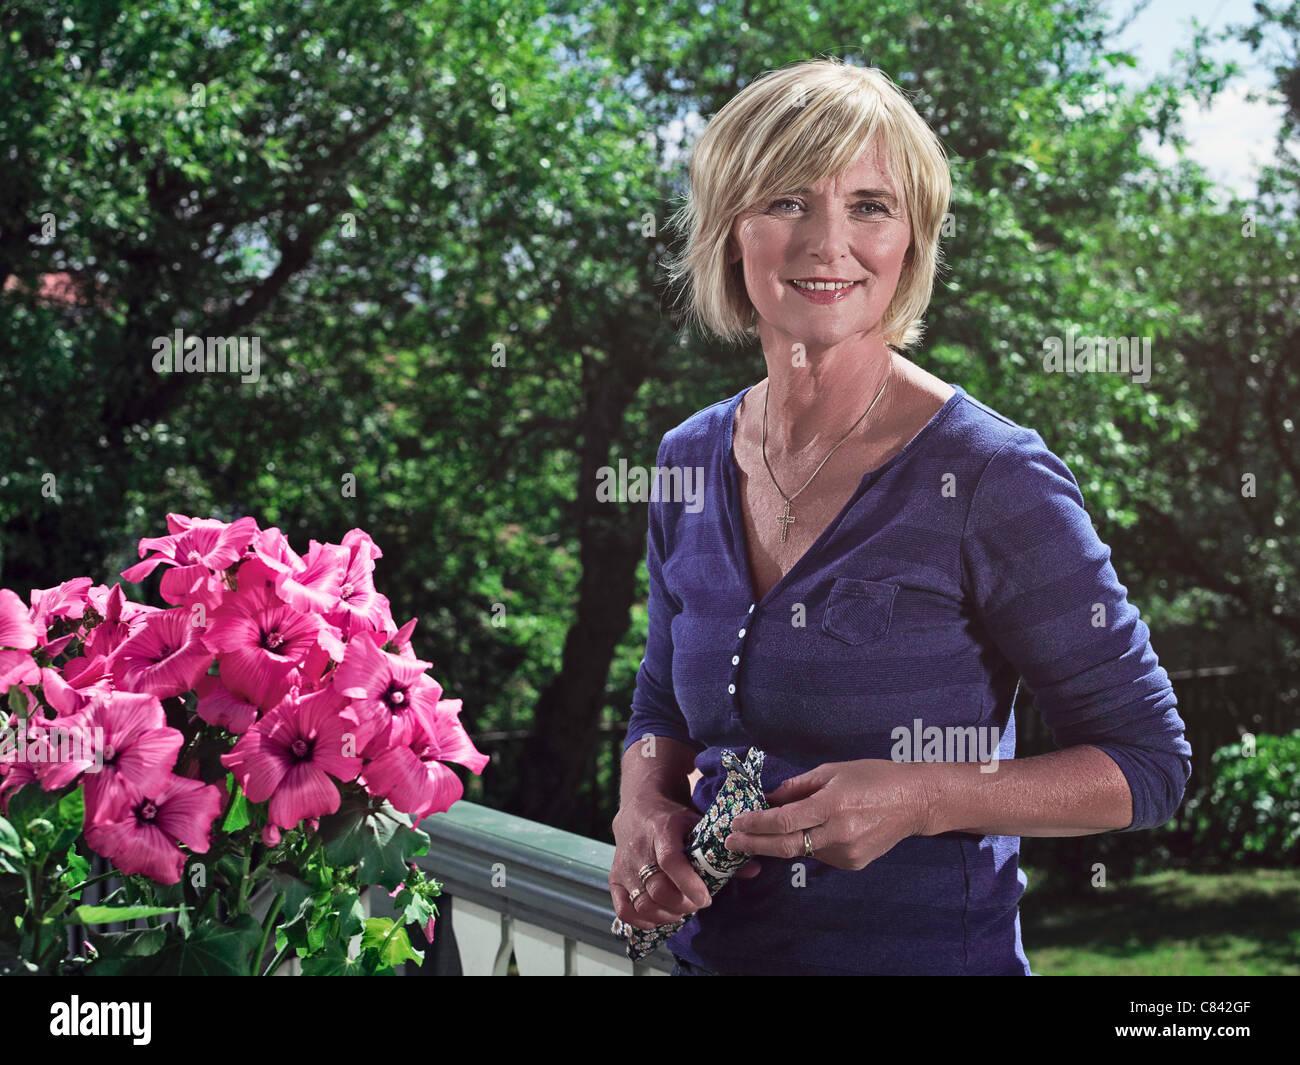 Woman smiling on balcony - Stock Image